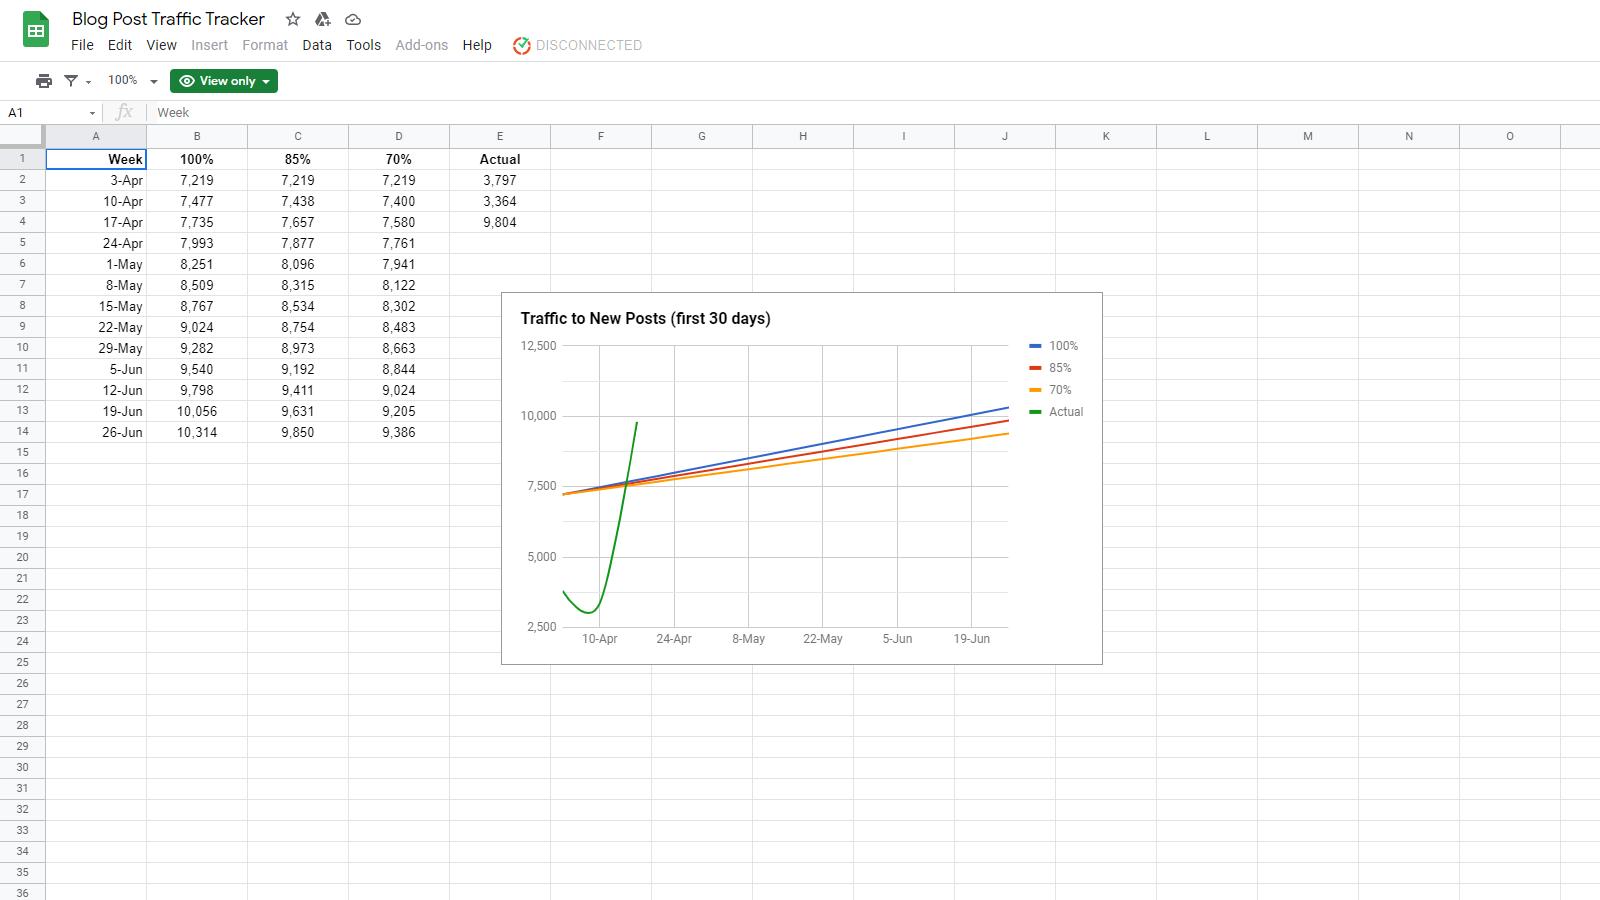 Blog Post Traffic Tracker